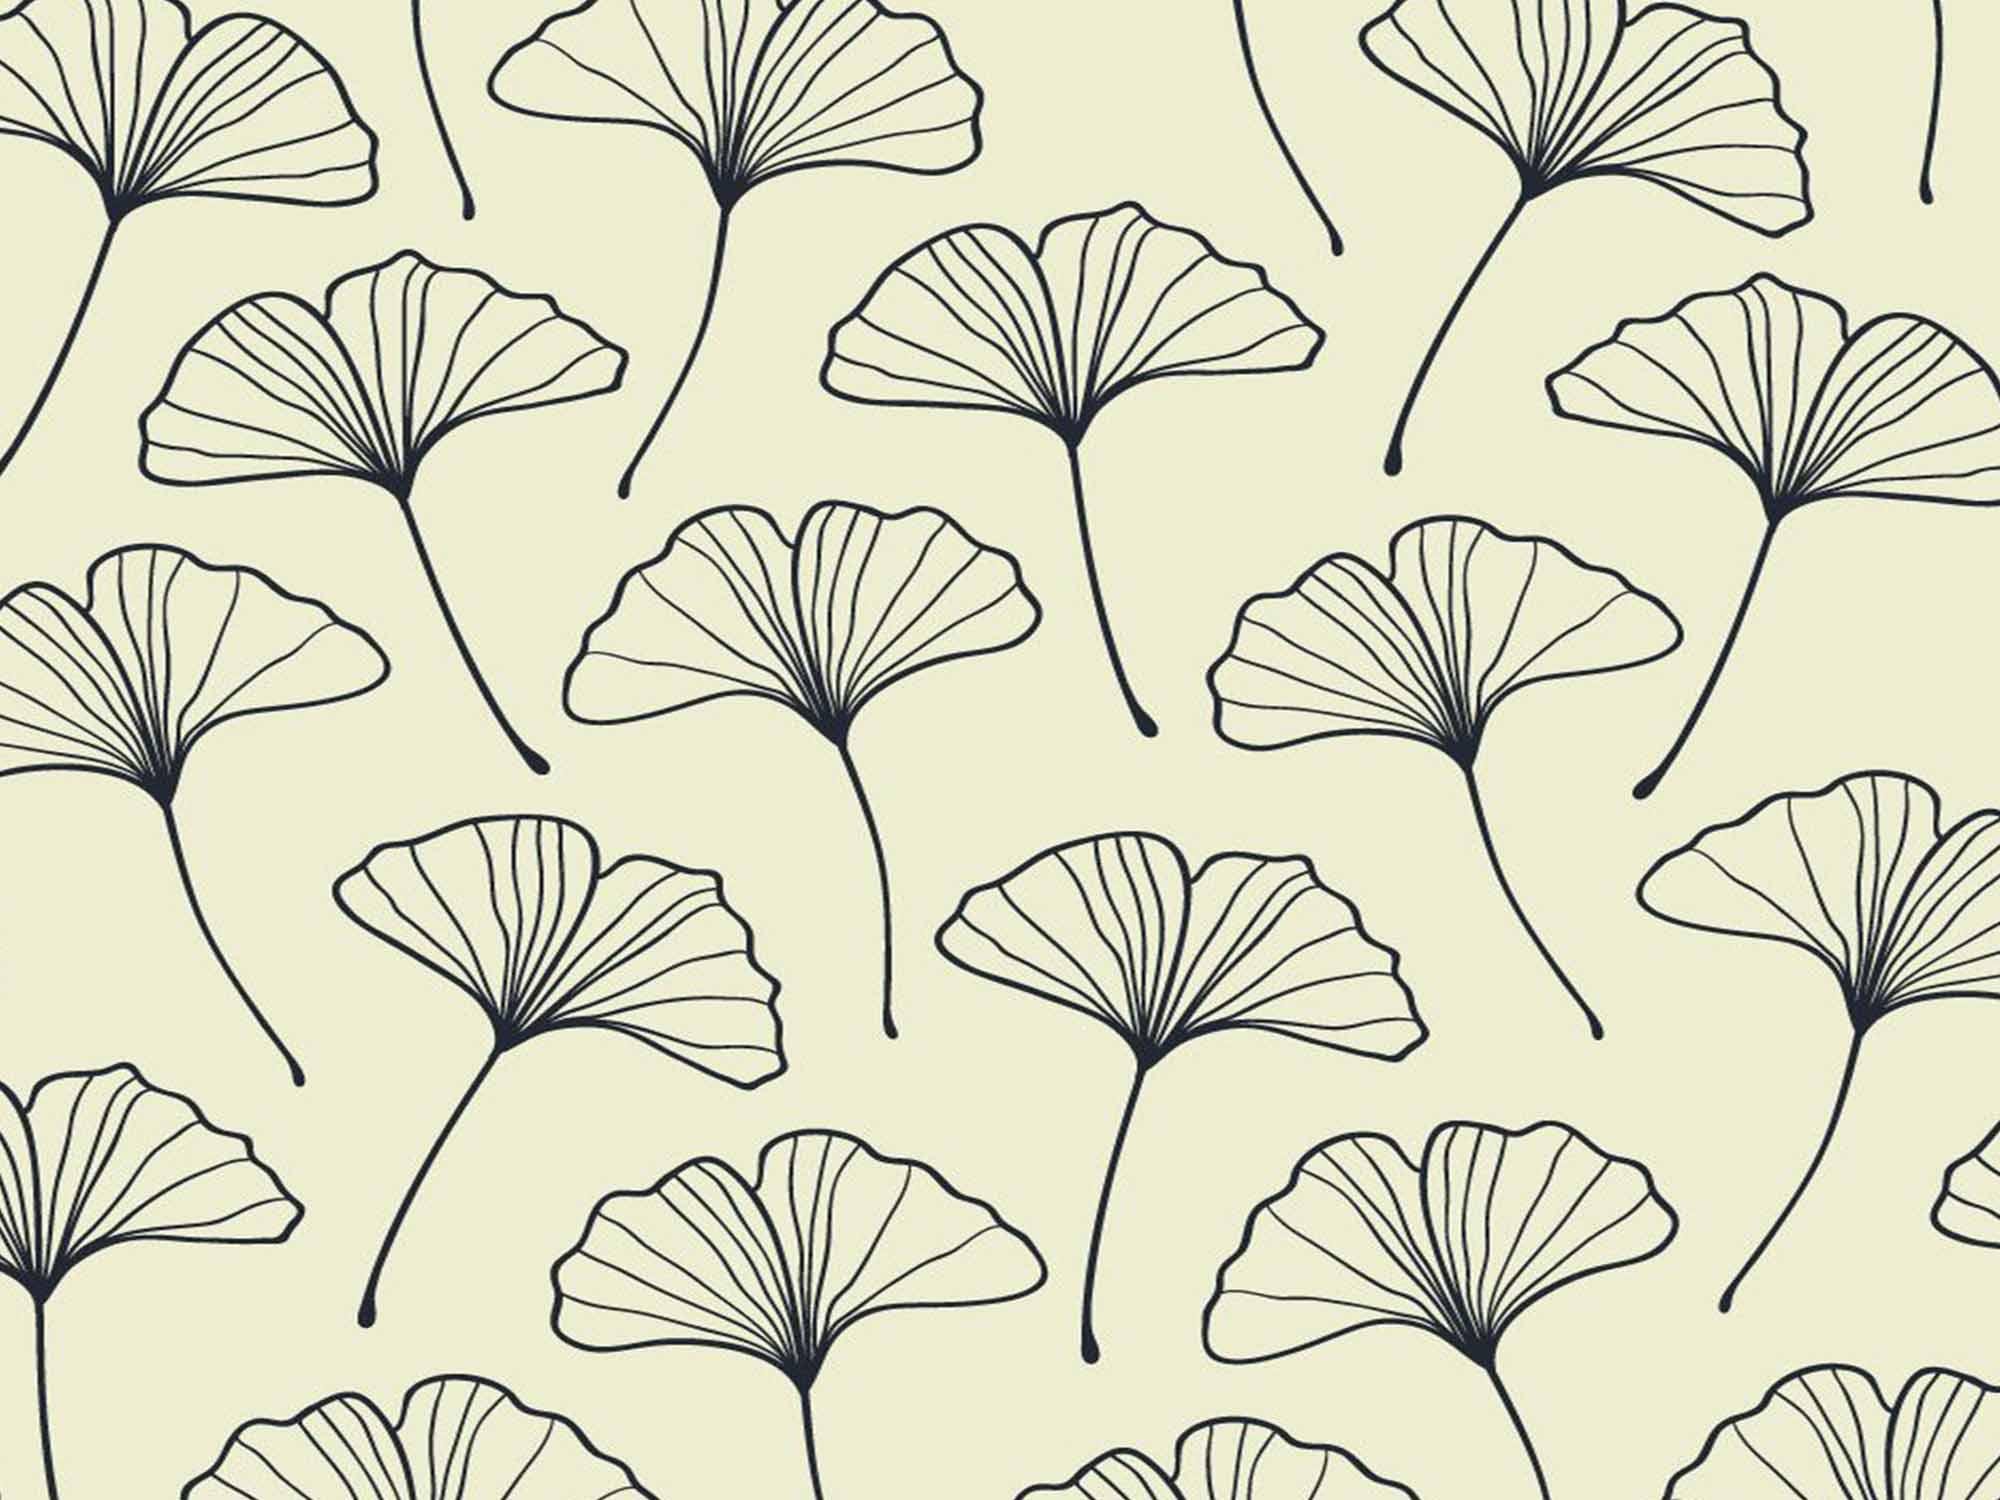 Papel de Parede Floral 0090 - Adesivos de Parede  - Paredes Decoradas